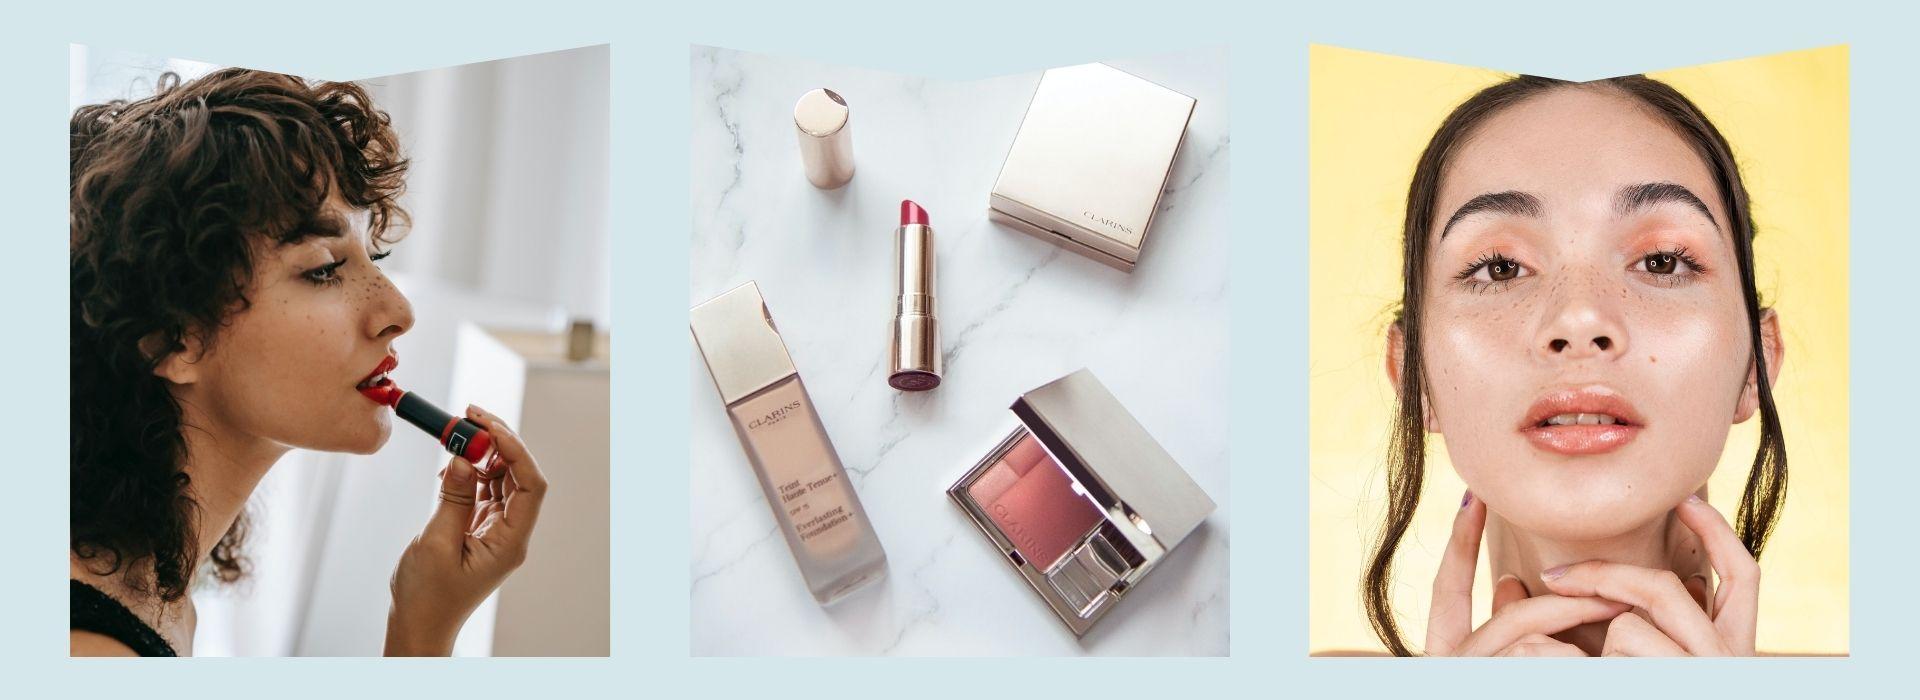 Berry lipstick, pastel makeup, glowy skin